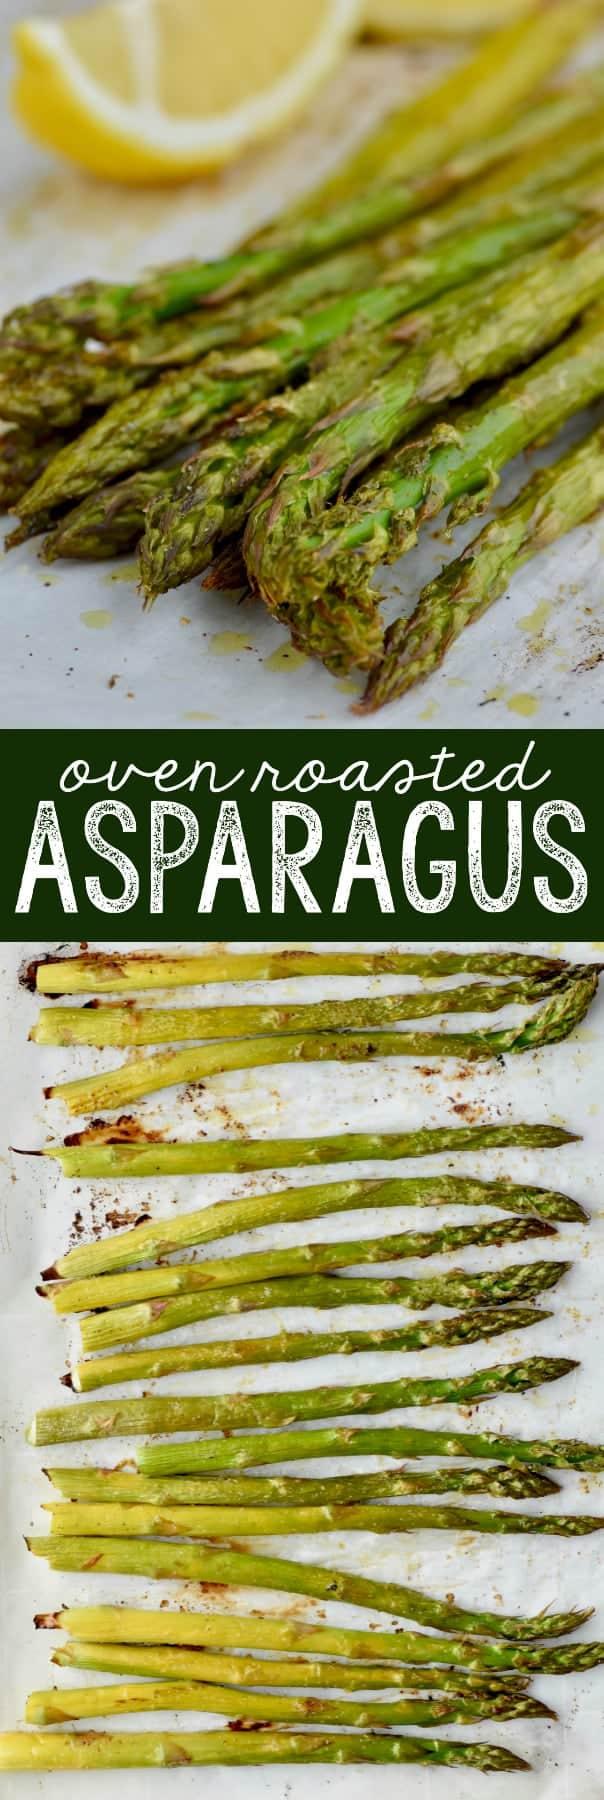 Wondrous Lemons Oven Roasted Asparagus Recipe Wine Glue Roasted Asparagus Side Dish Recipes Baked Asparagus Side Dish Recipes Up Close Oven Roasted Asparagus nice food Asparagus Side Dish Recipes